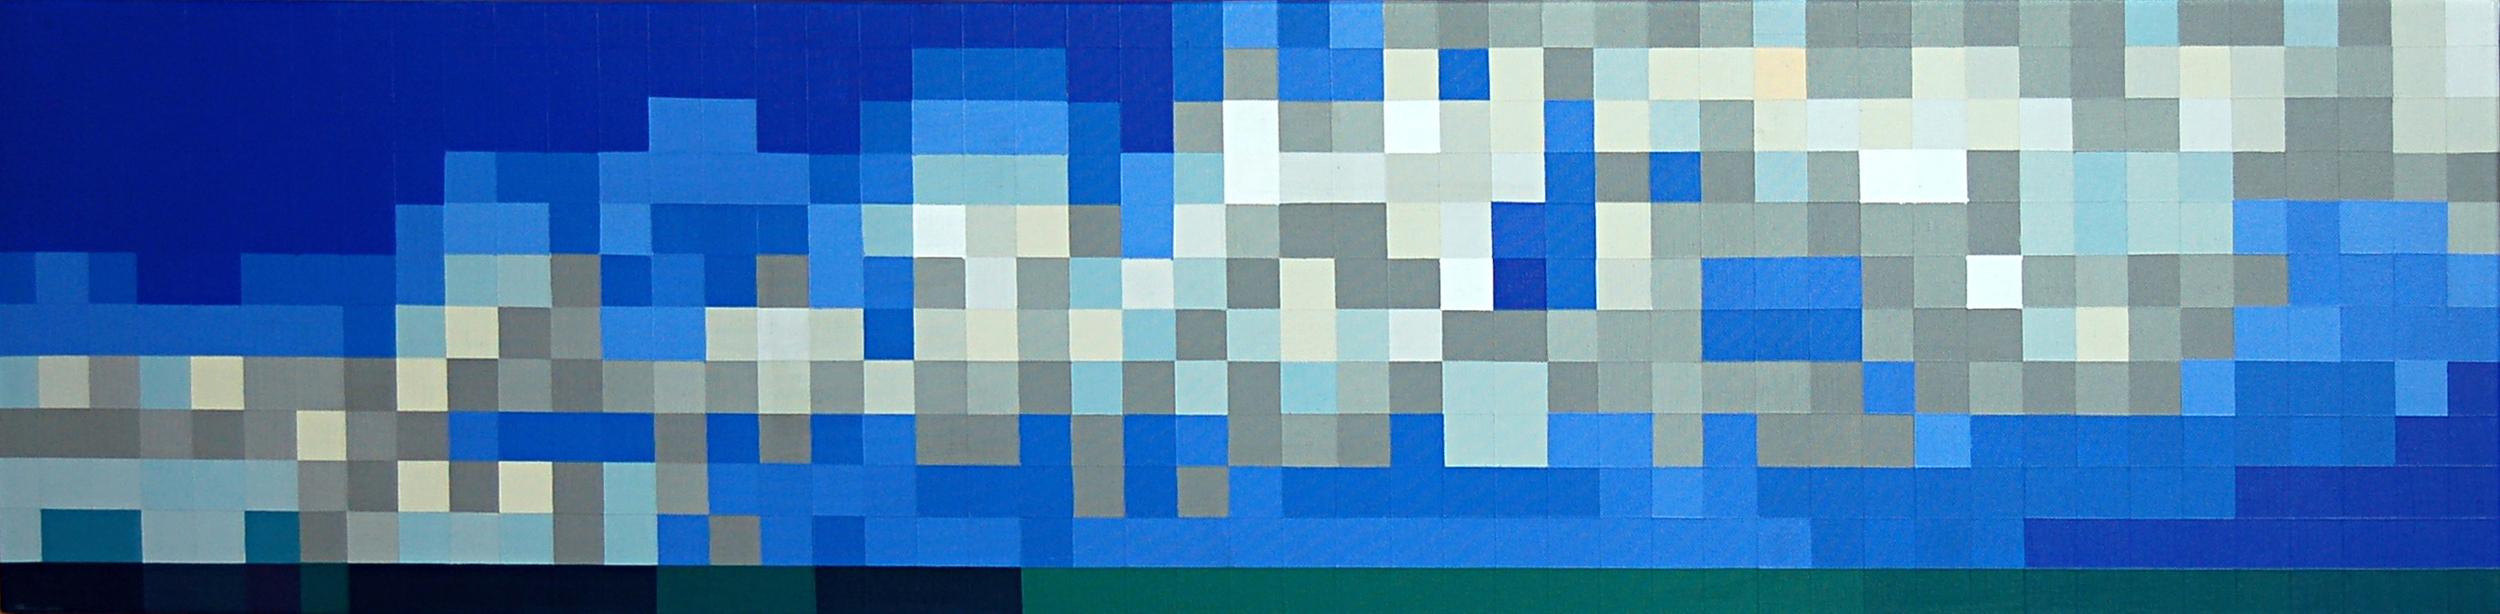 "Landscape, Acrylic on canvas, 2014, 48"" x 12"""